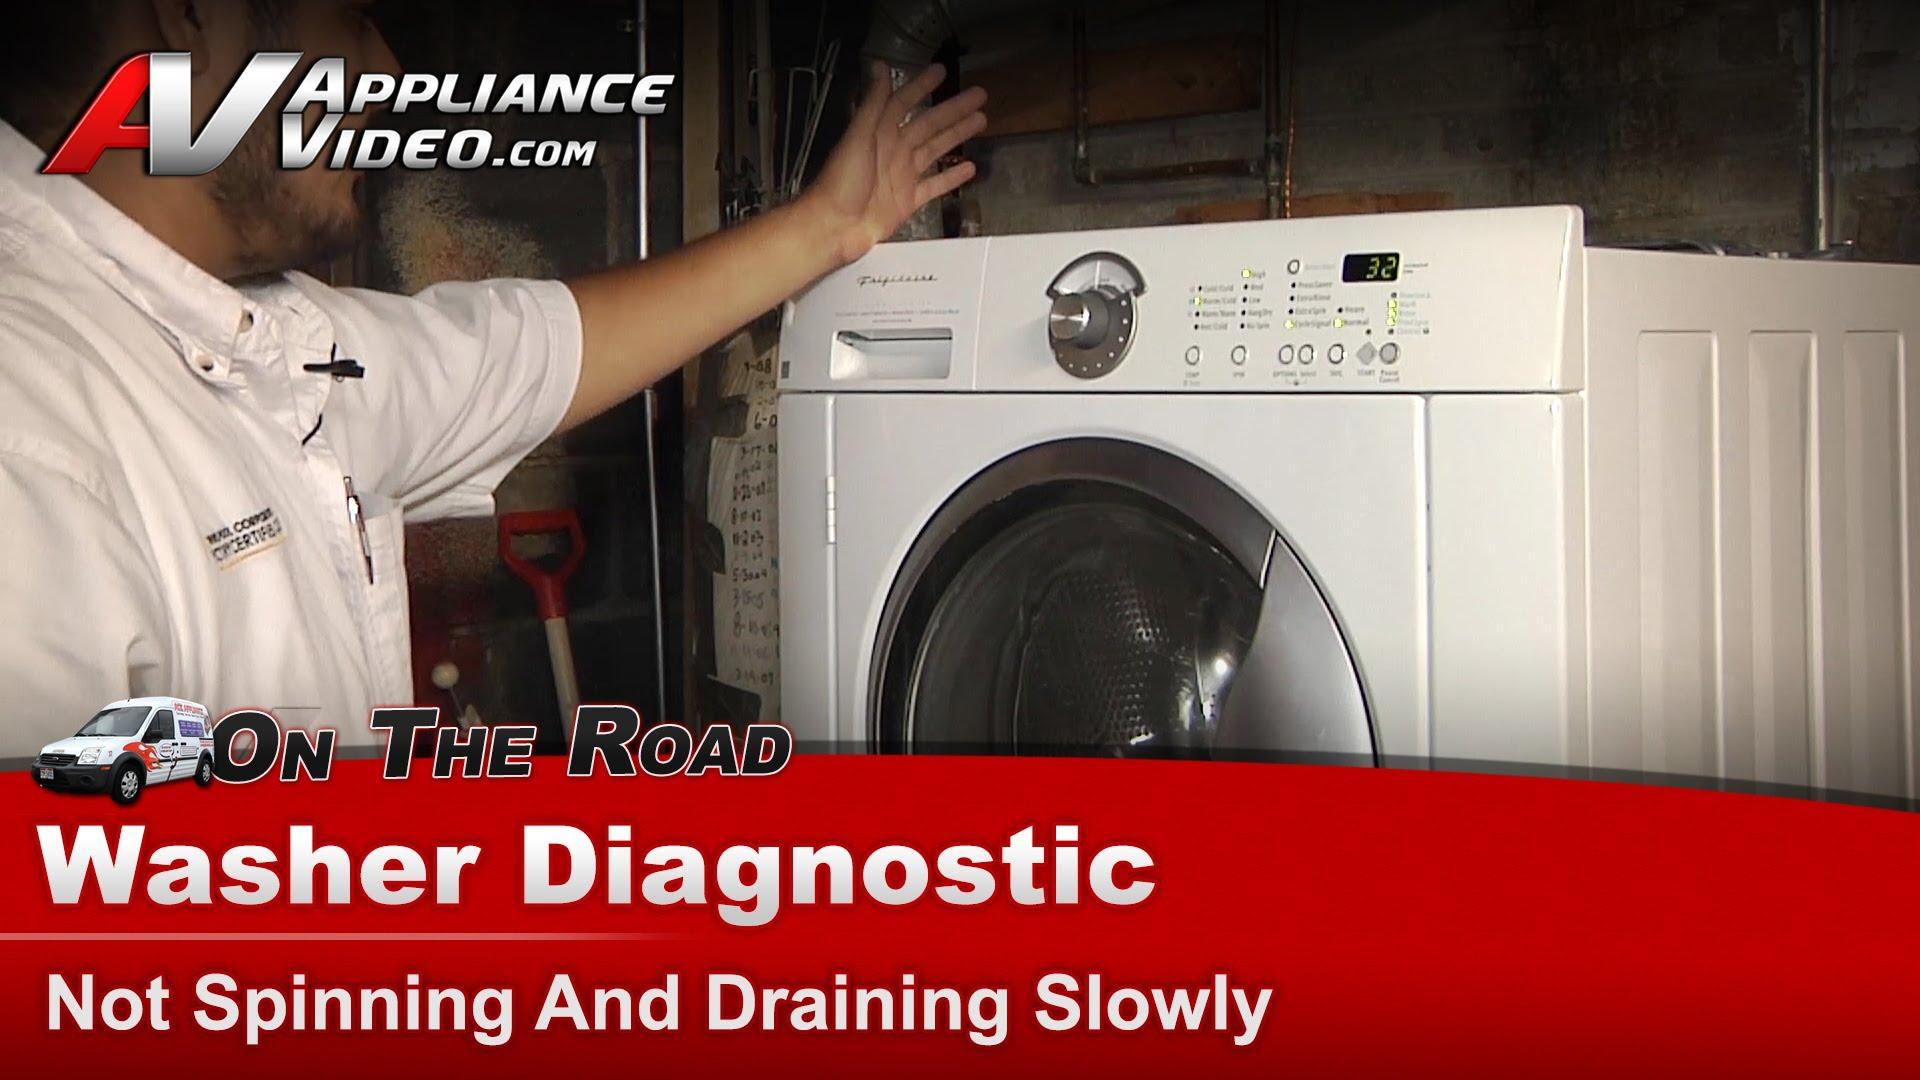 Frigidaire Glt52940fs2 Washer Diagnostic Not Spinning